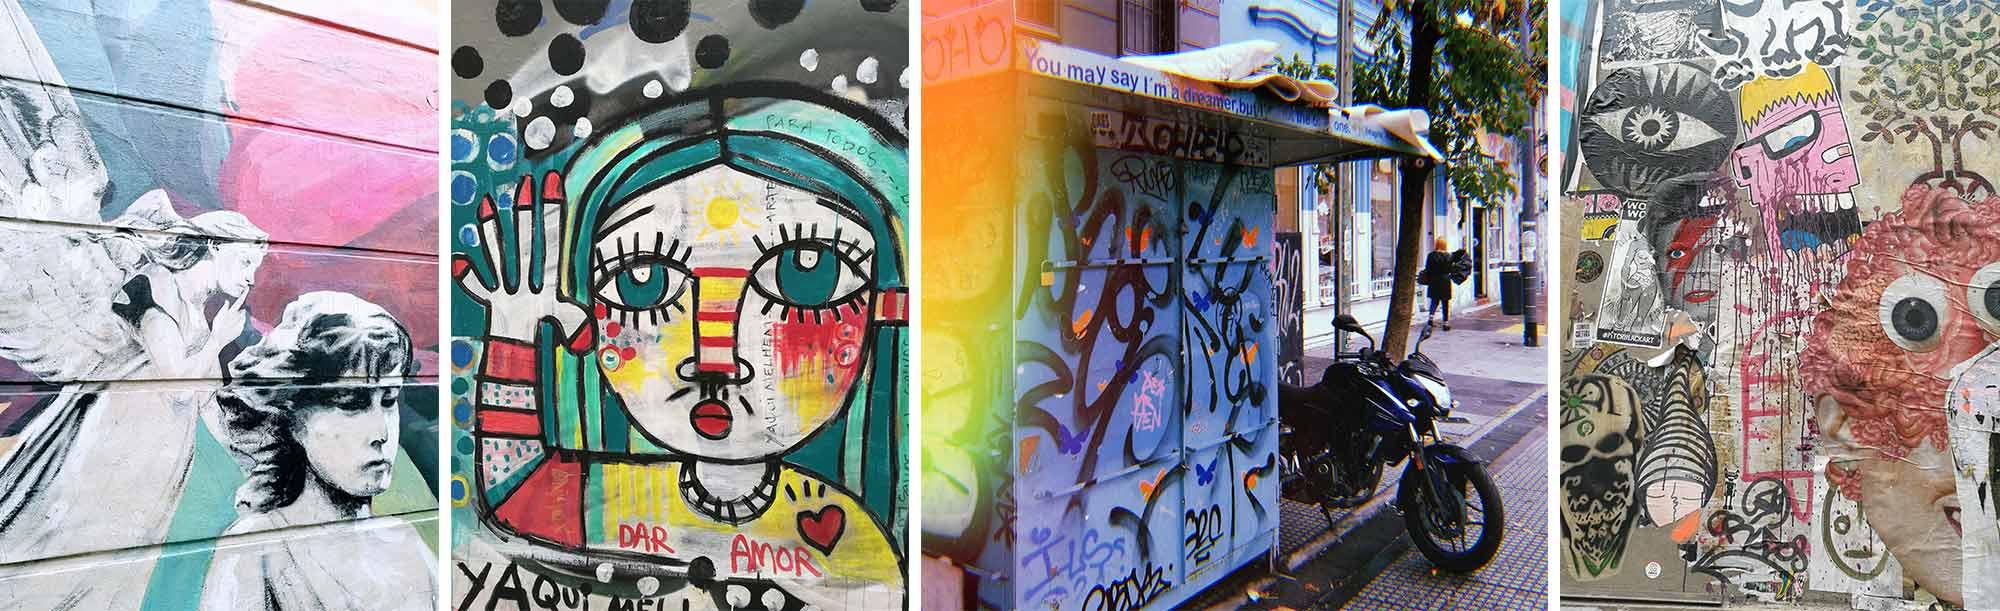 Femtastics_Lola-Behrens_BuenosAires_Streetart